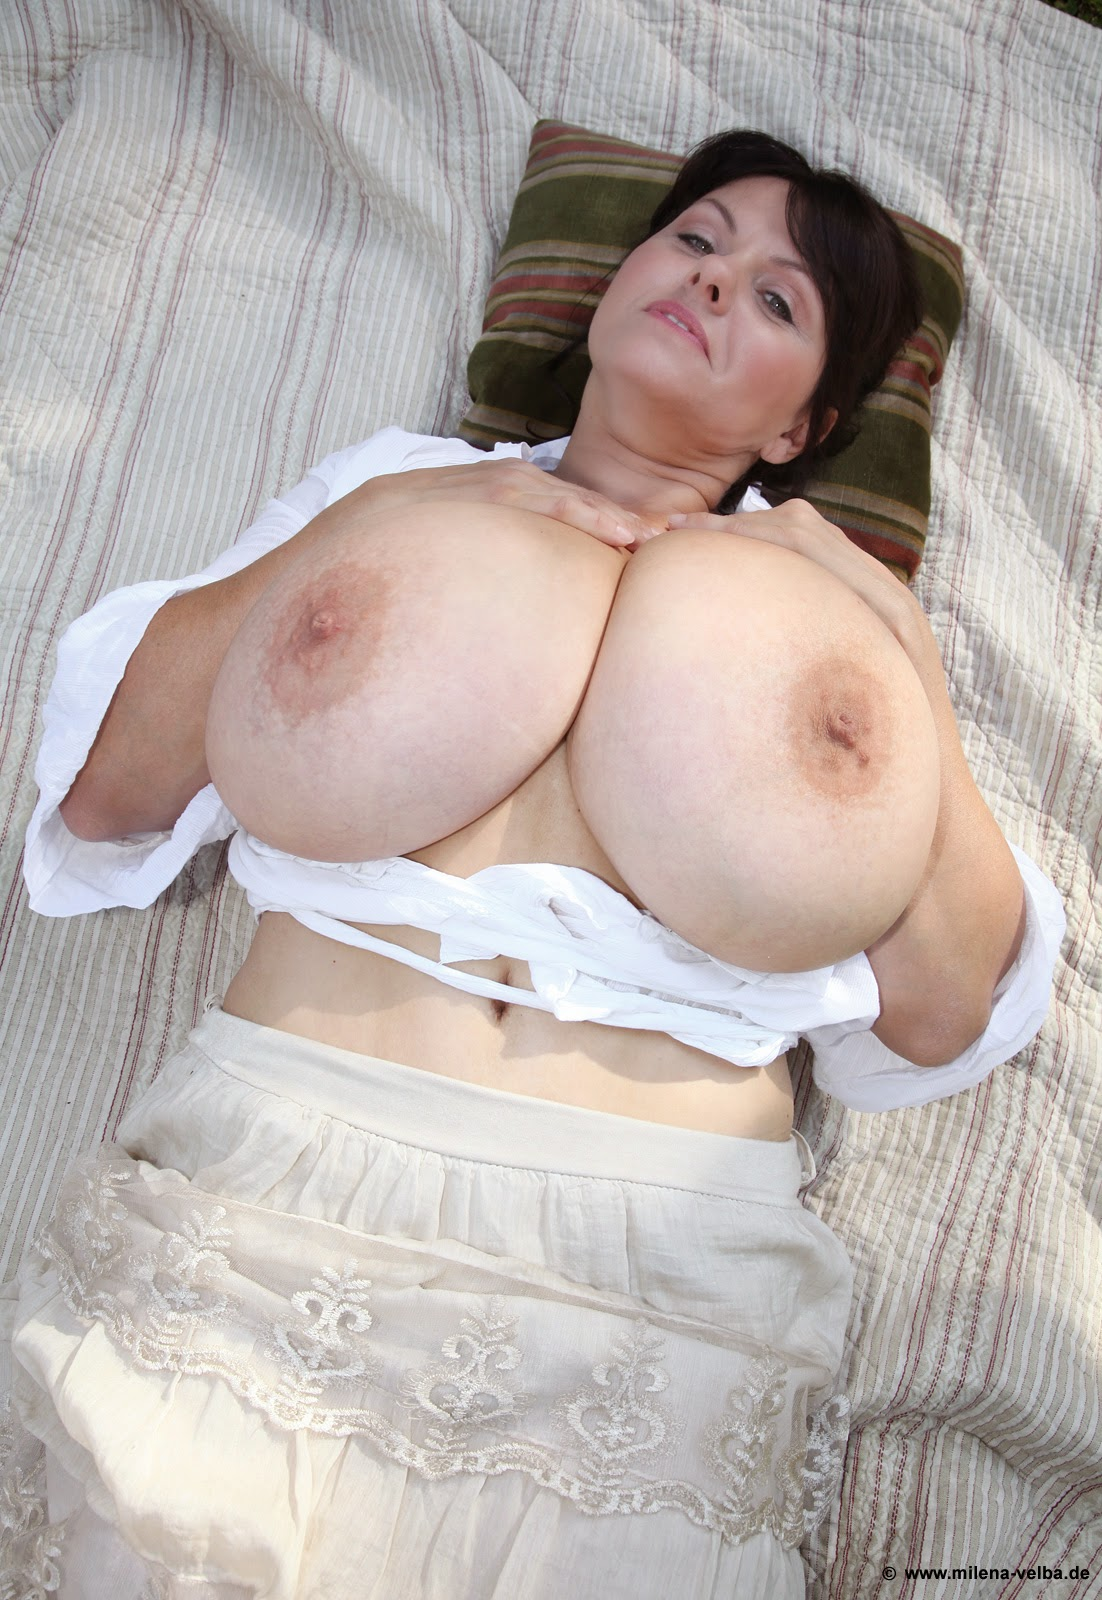 porn my photos by milena velba